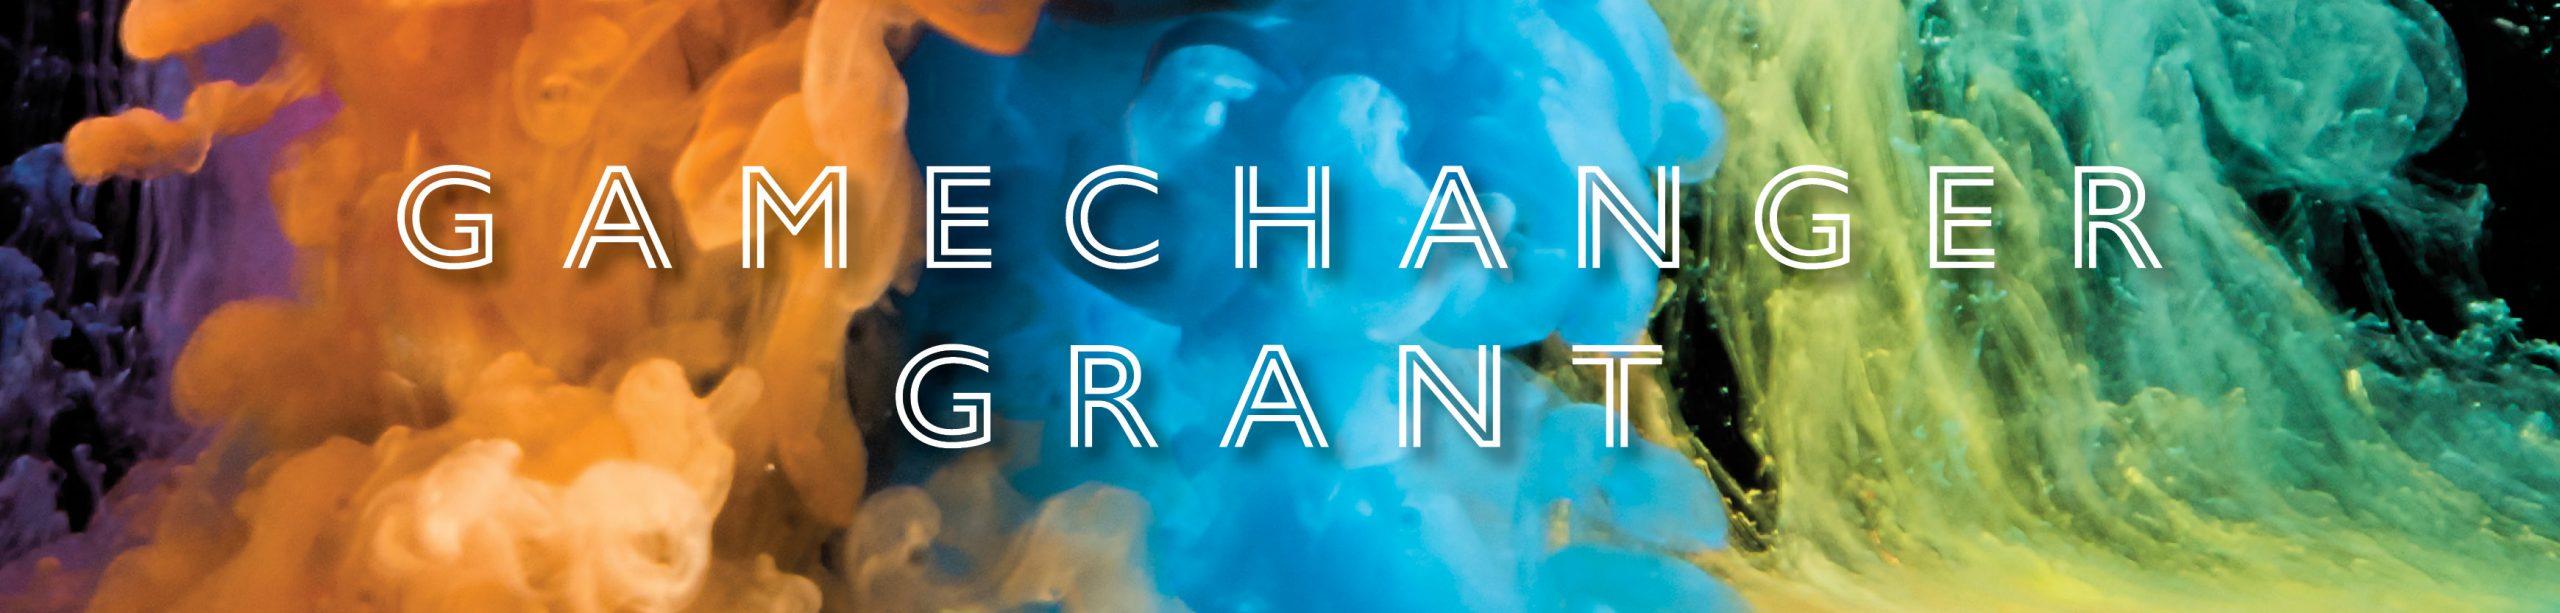 Game Changer Grant